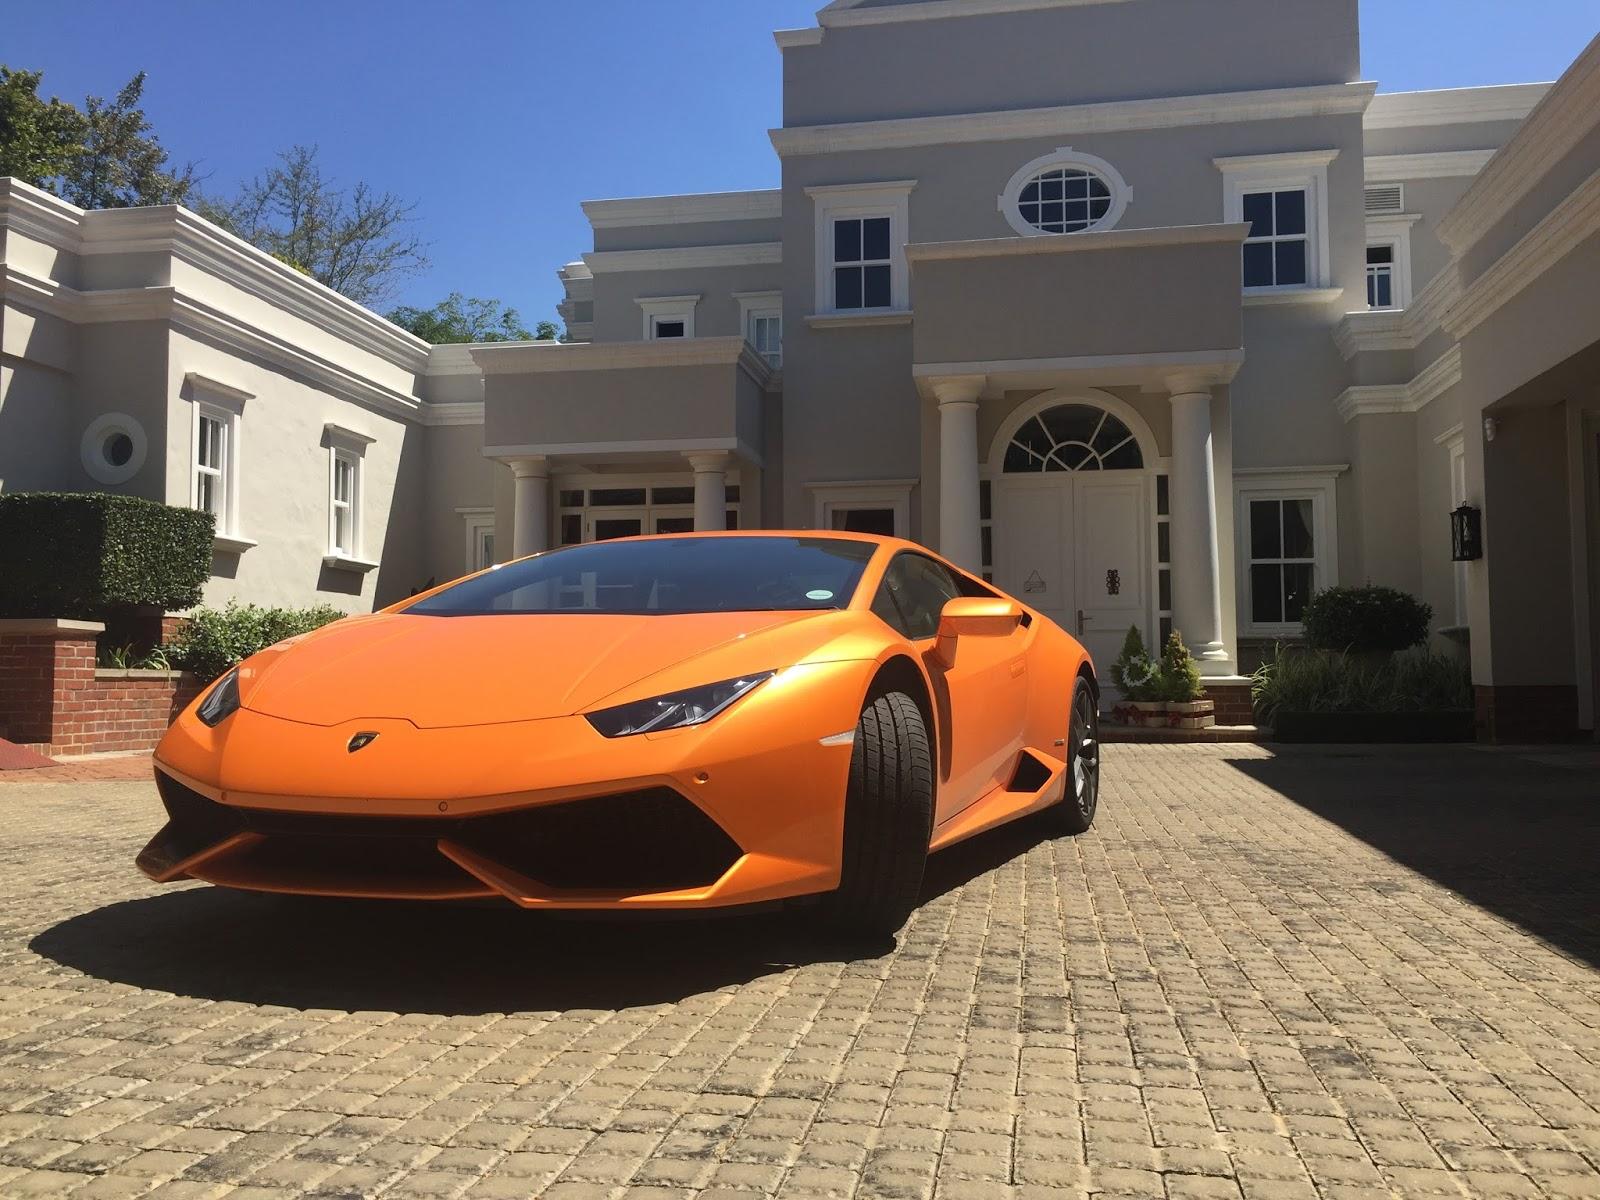 zero2turbo-lamborghini-huracan-lp-610-4-driven-review-south-africa%2B%25282%2529 Mesmerizing Lamborghini Huracan Price In south Africa Cars Trend